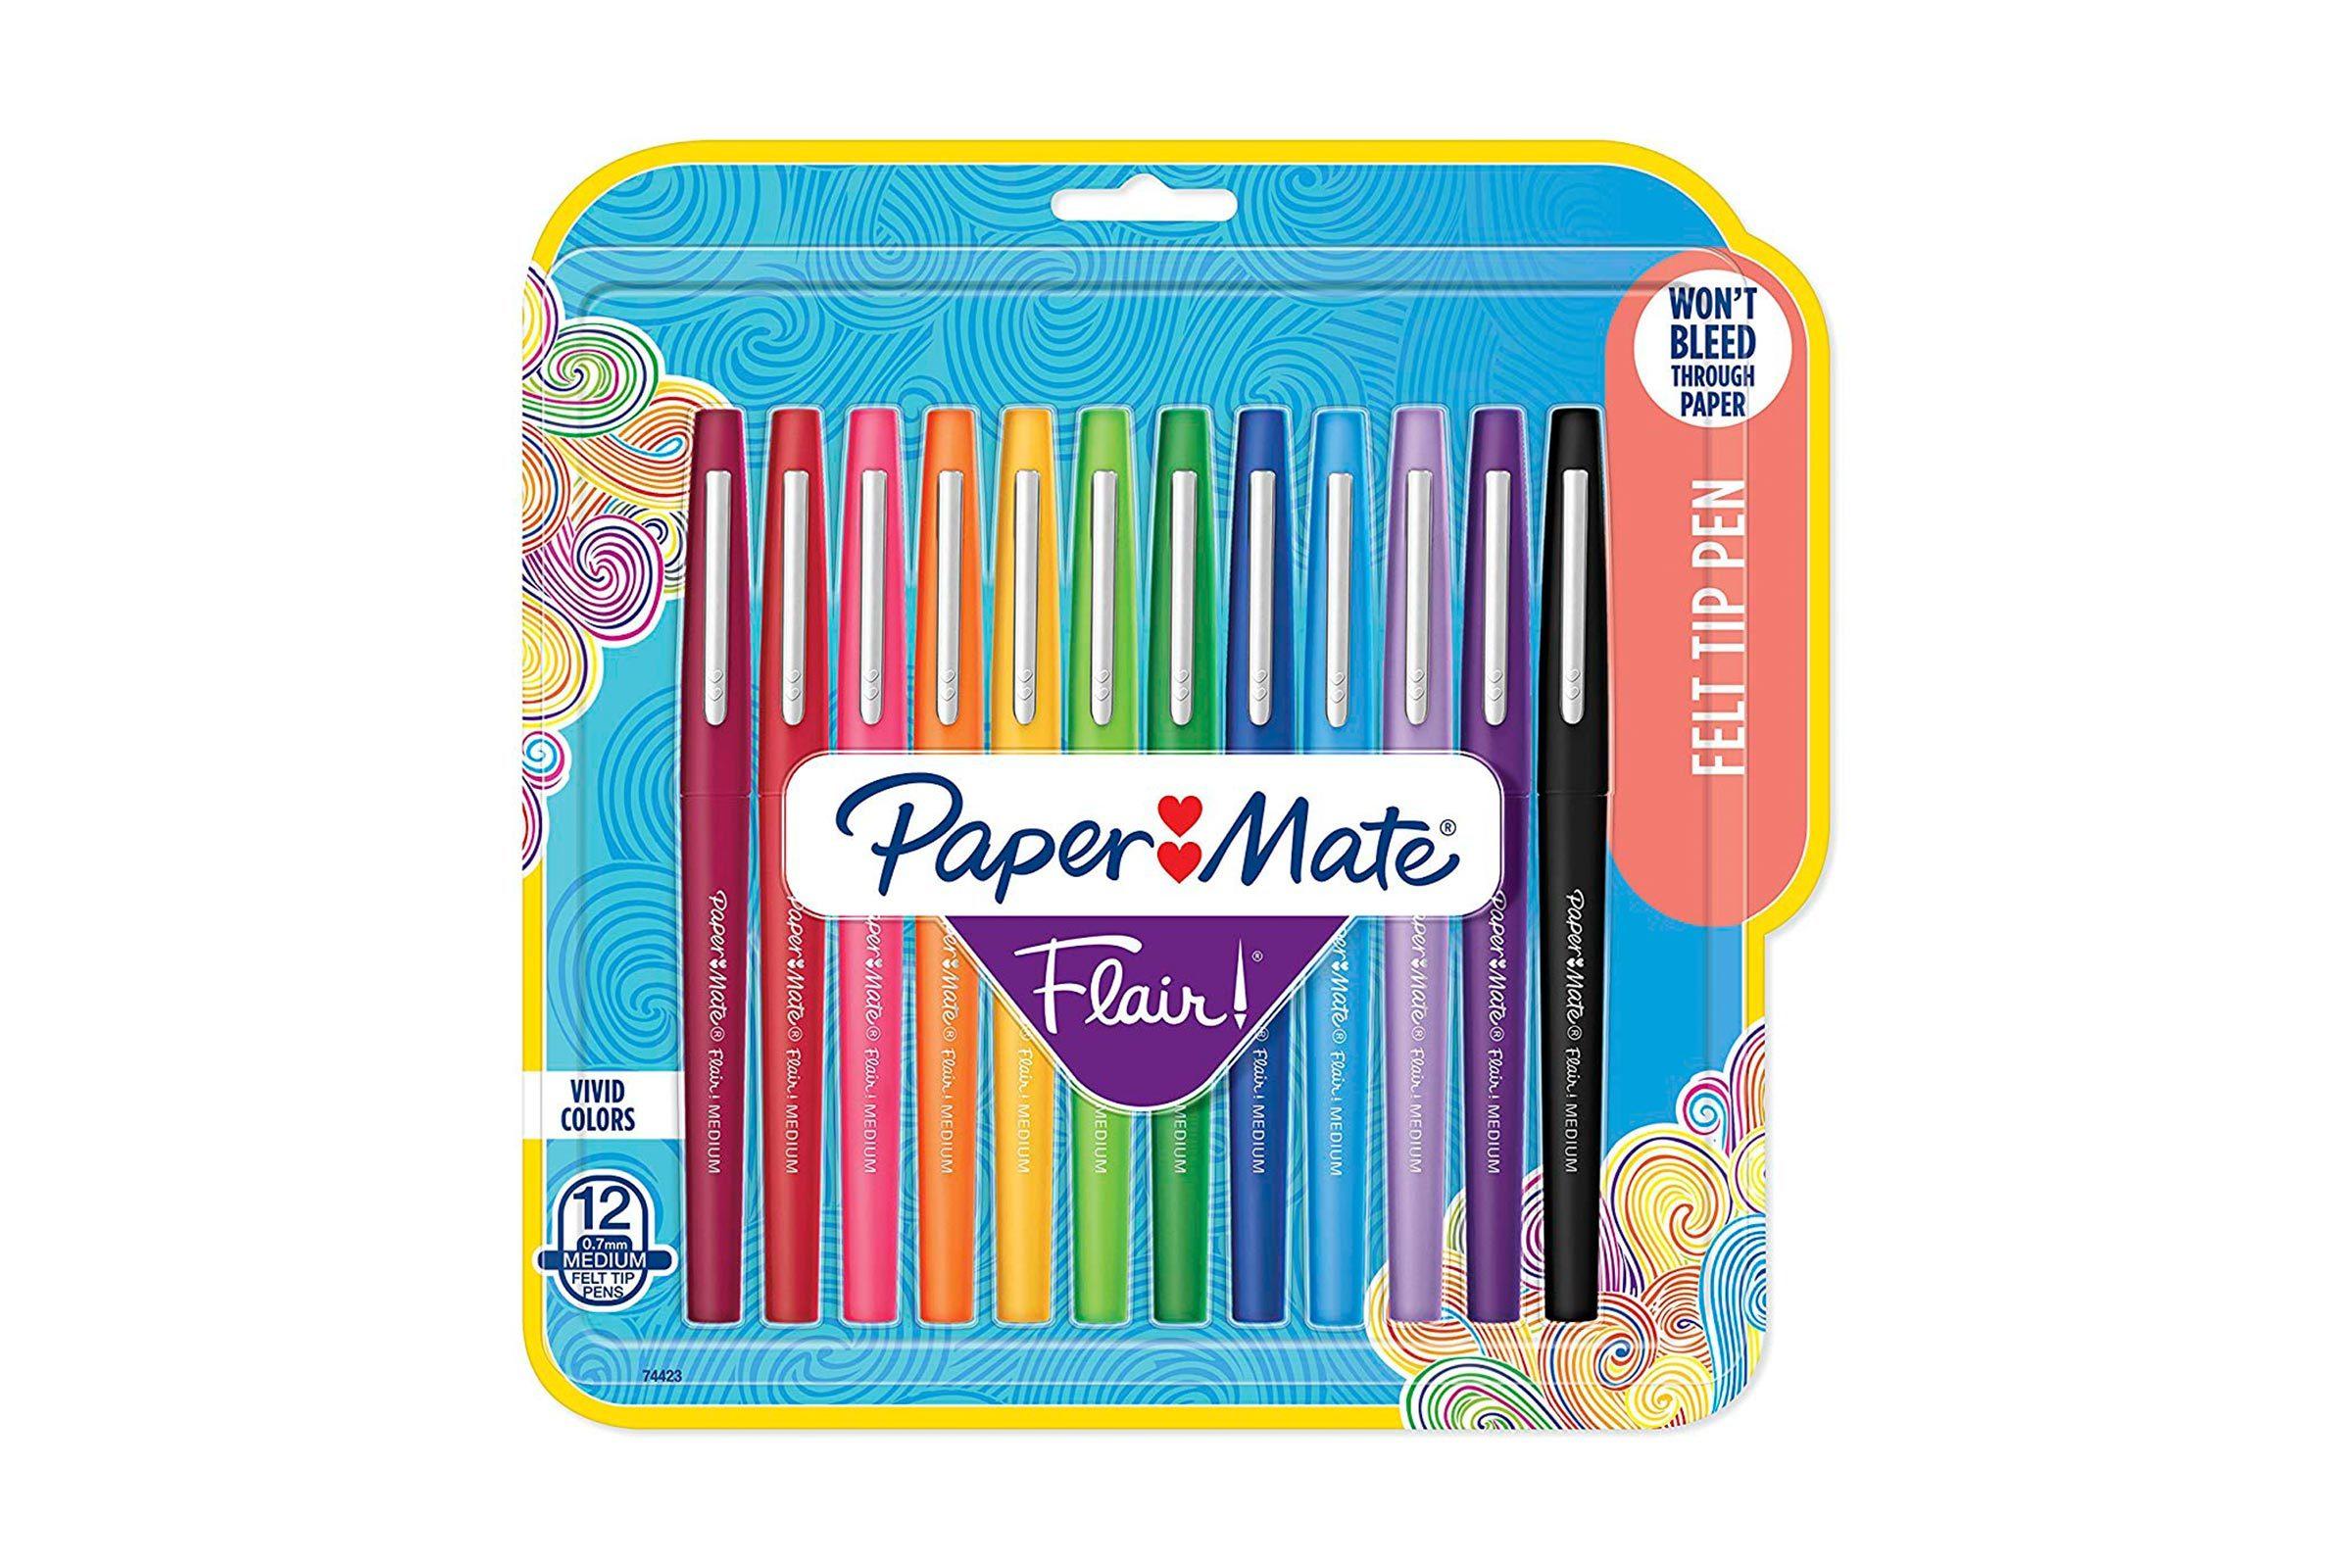 Papermate felt tip pens